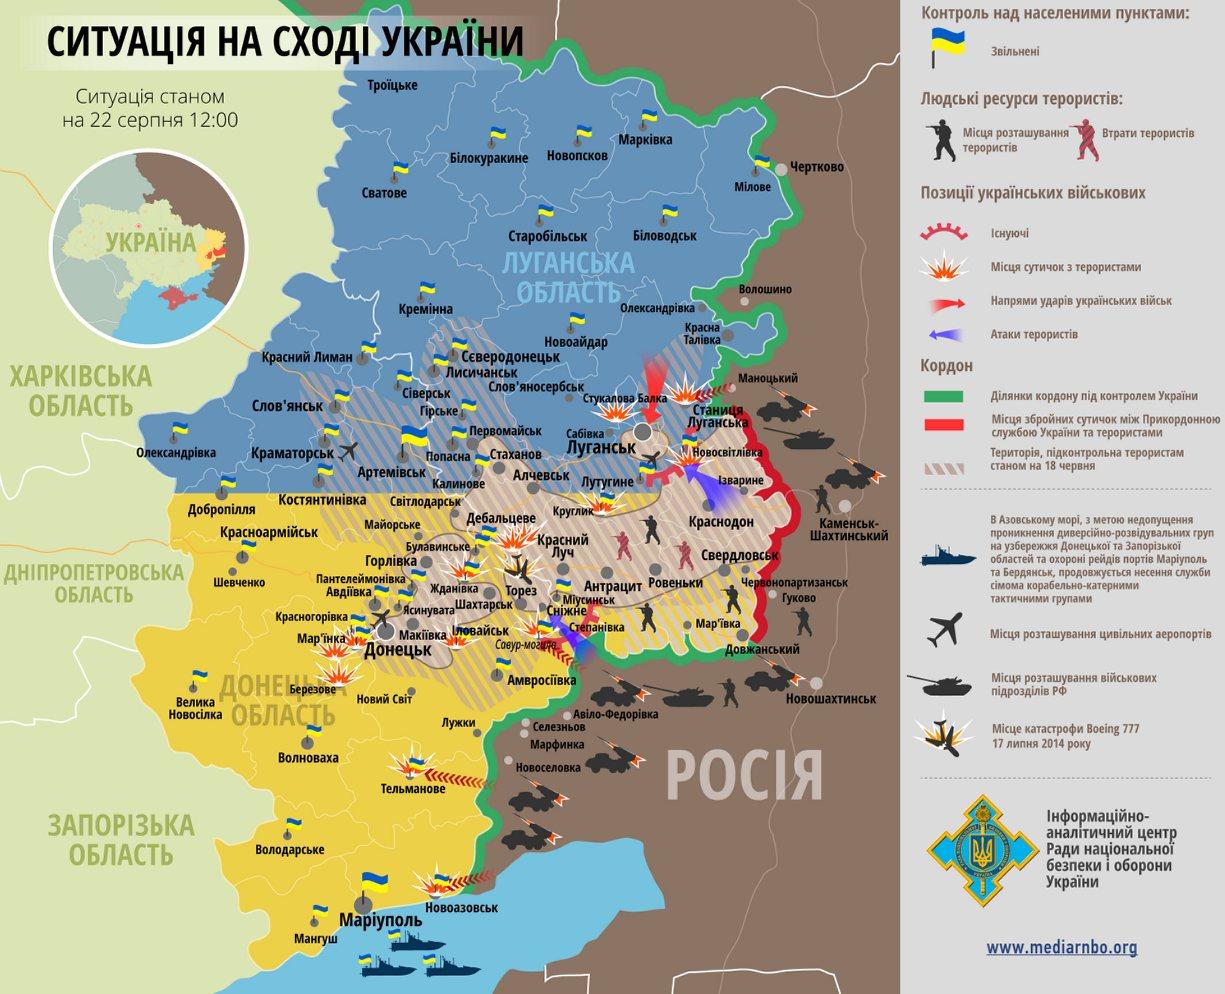 Конвой РФ обострил ситуацию в зоне АТО: карта боев